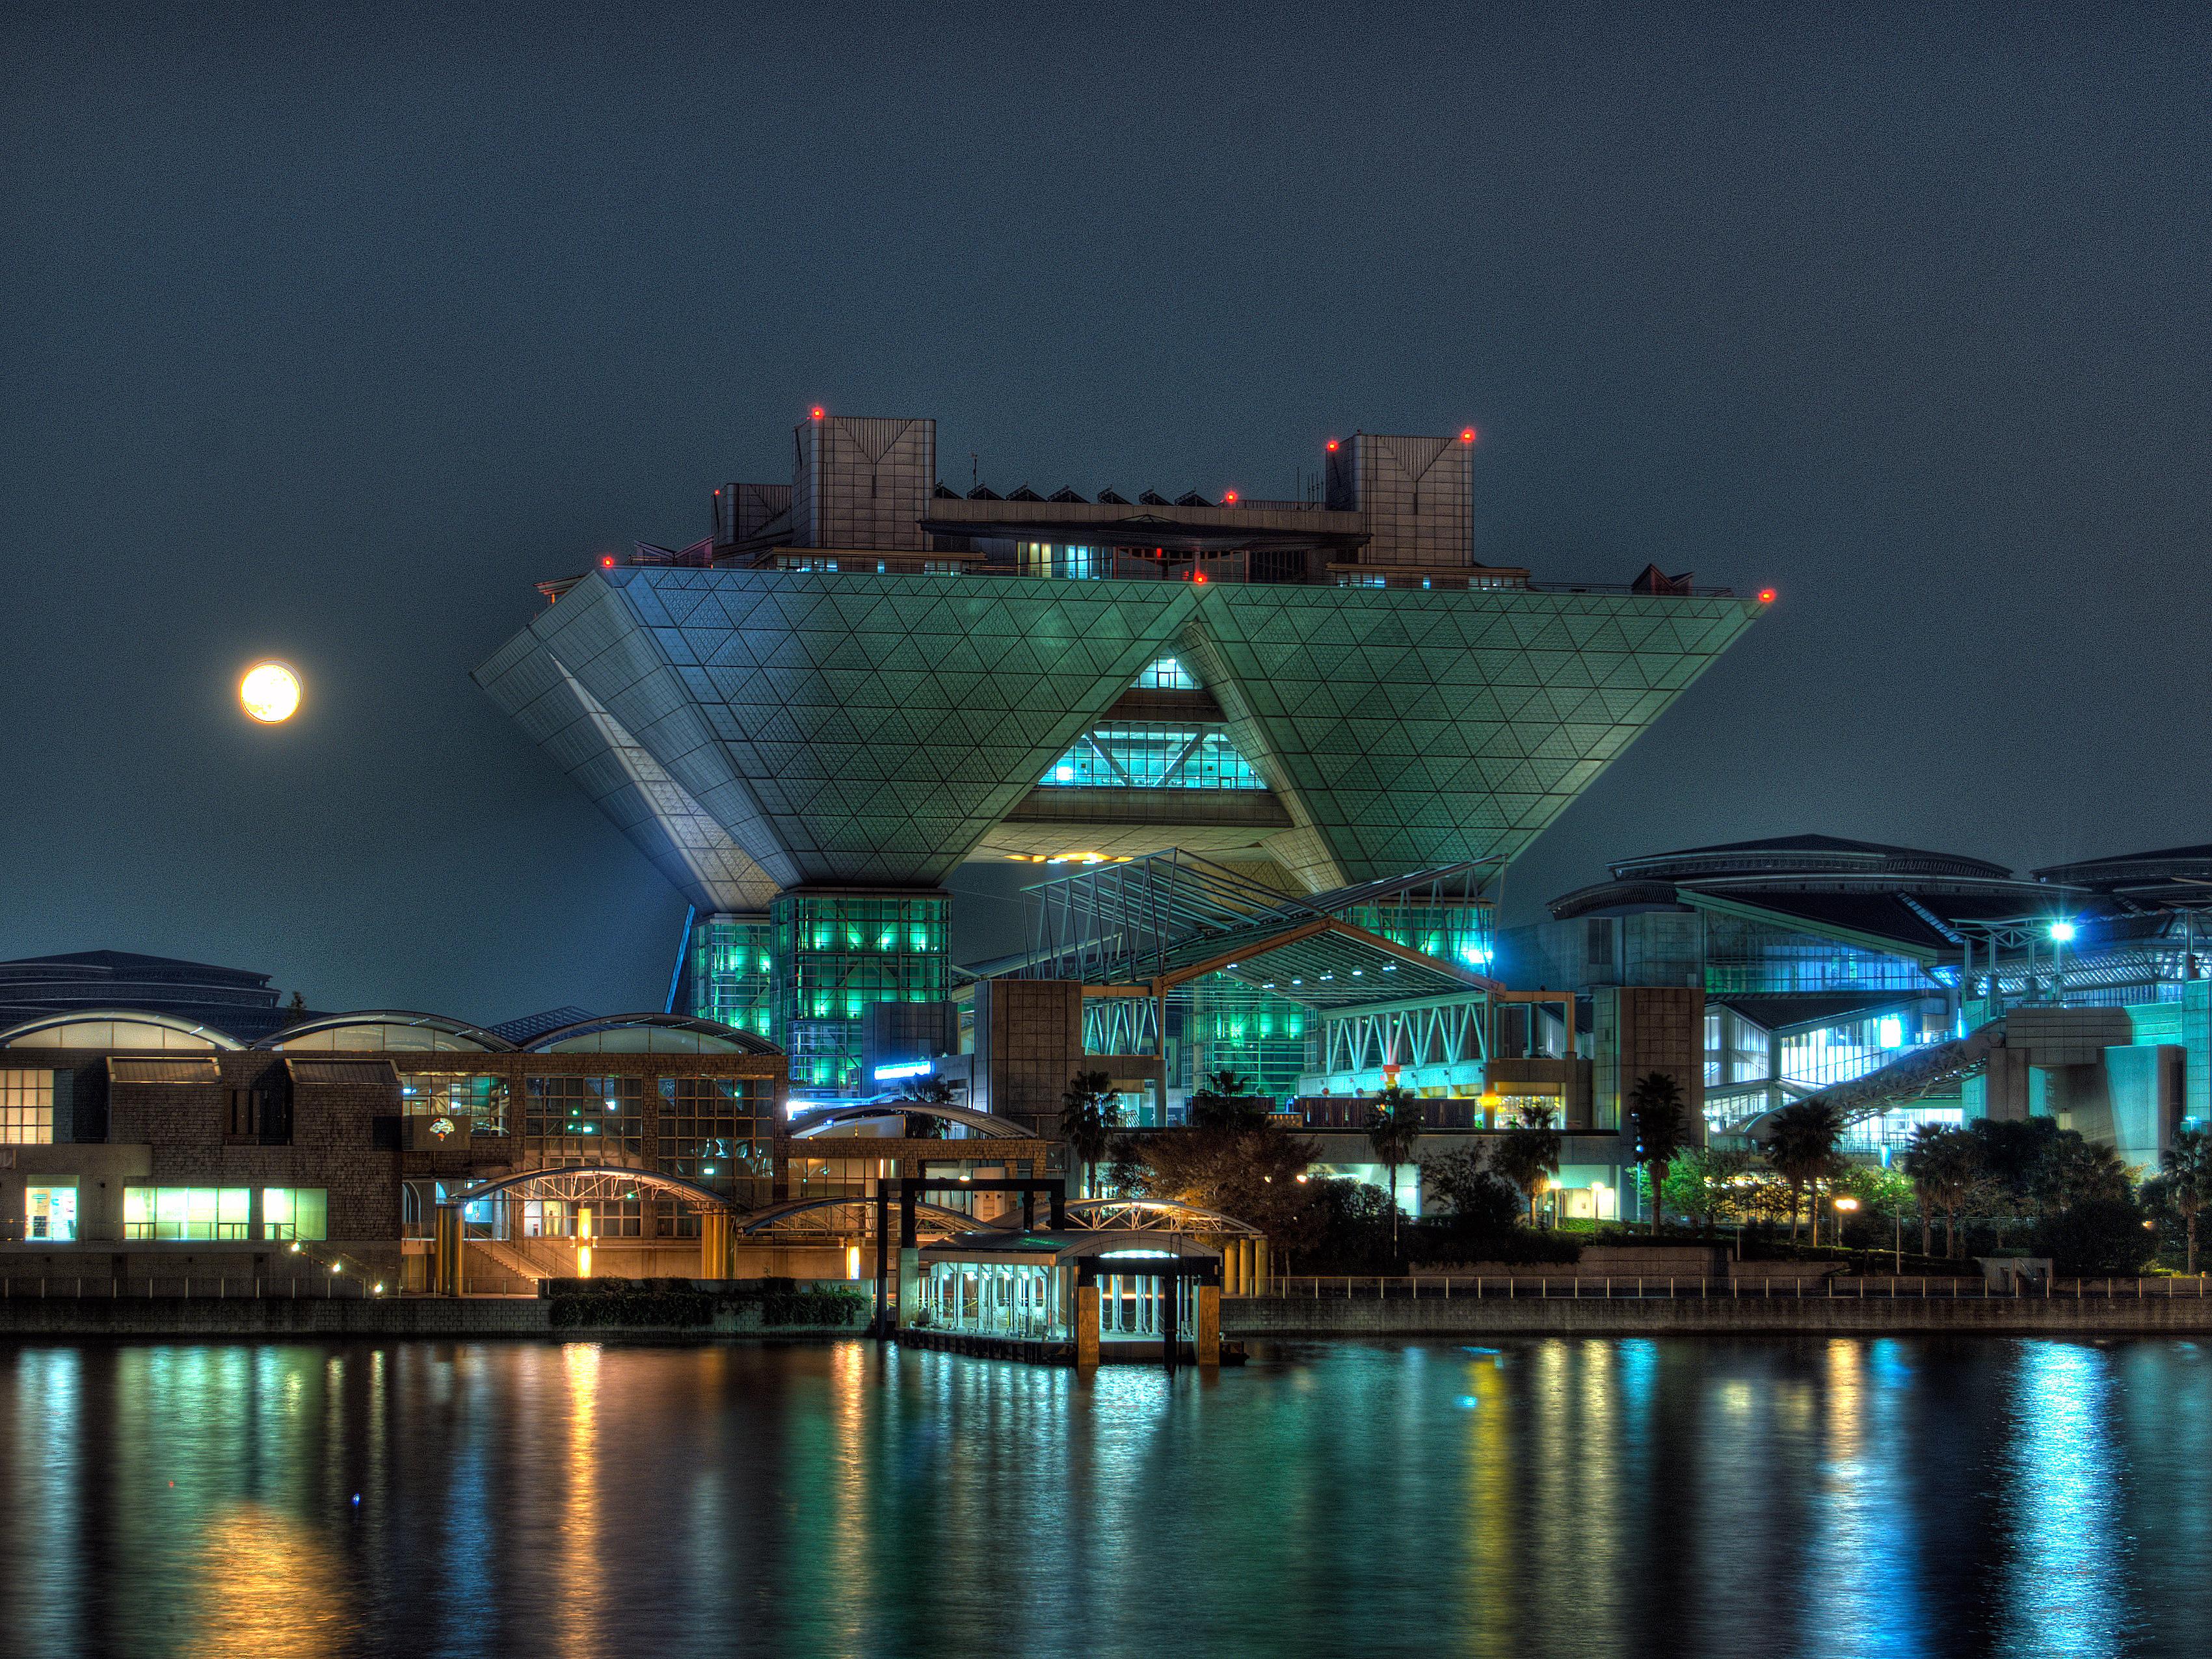 File:Tokyo Big Sight at Night.jpg - Wikimedia Commons